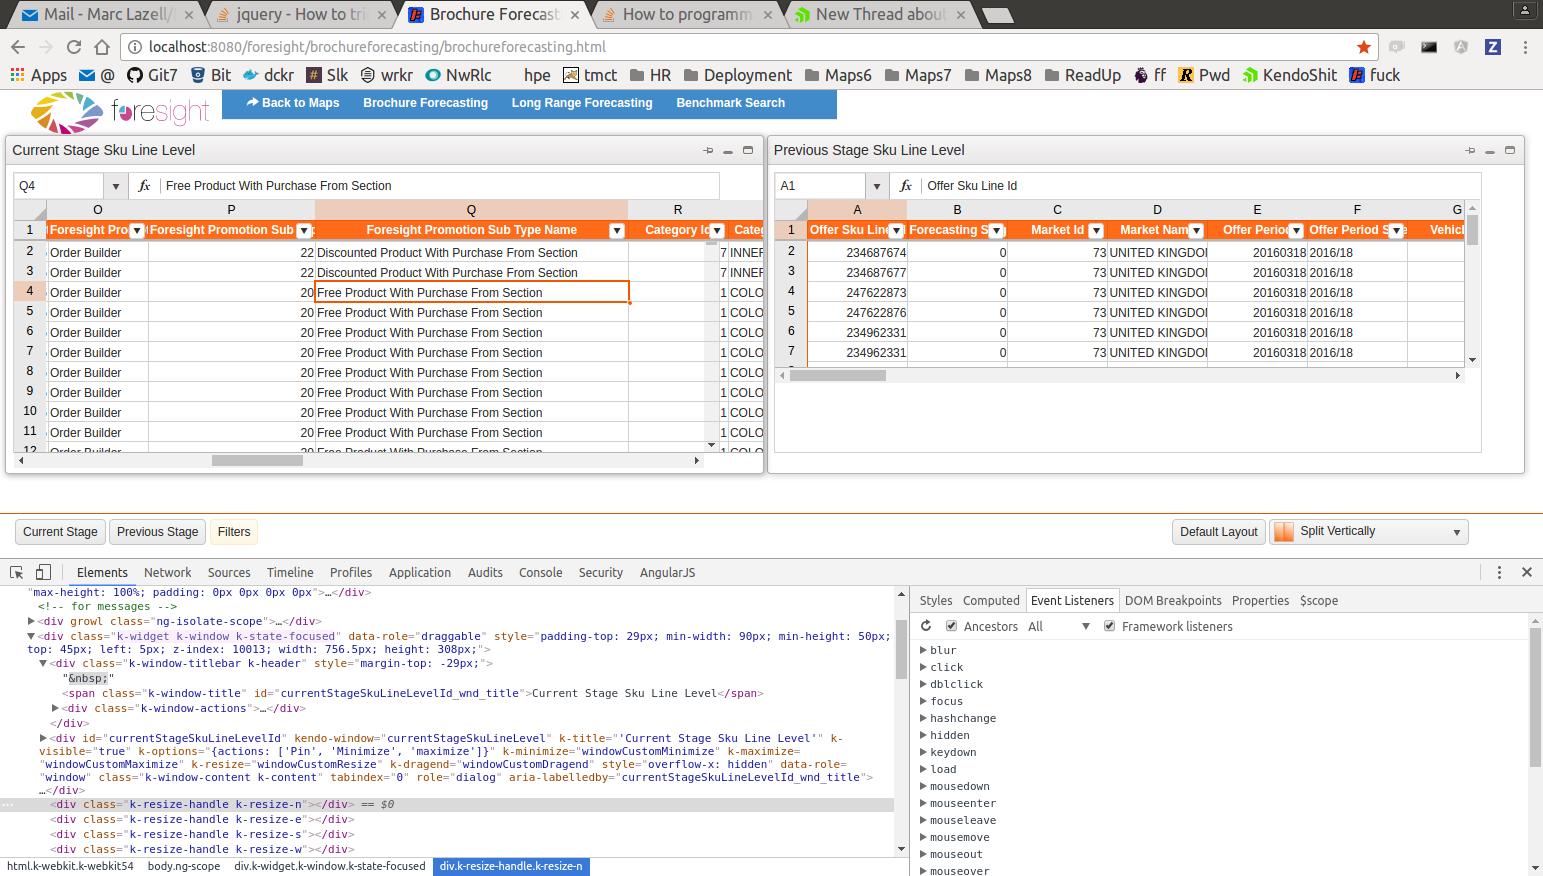 Spreadsheet doesn't resize automatically inside Window in Kendo UI